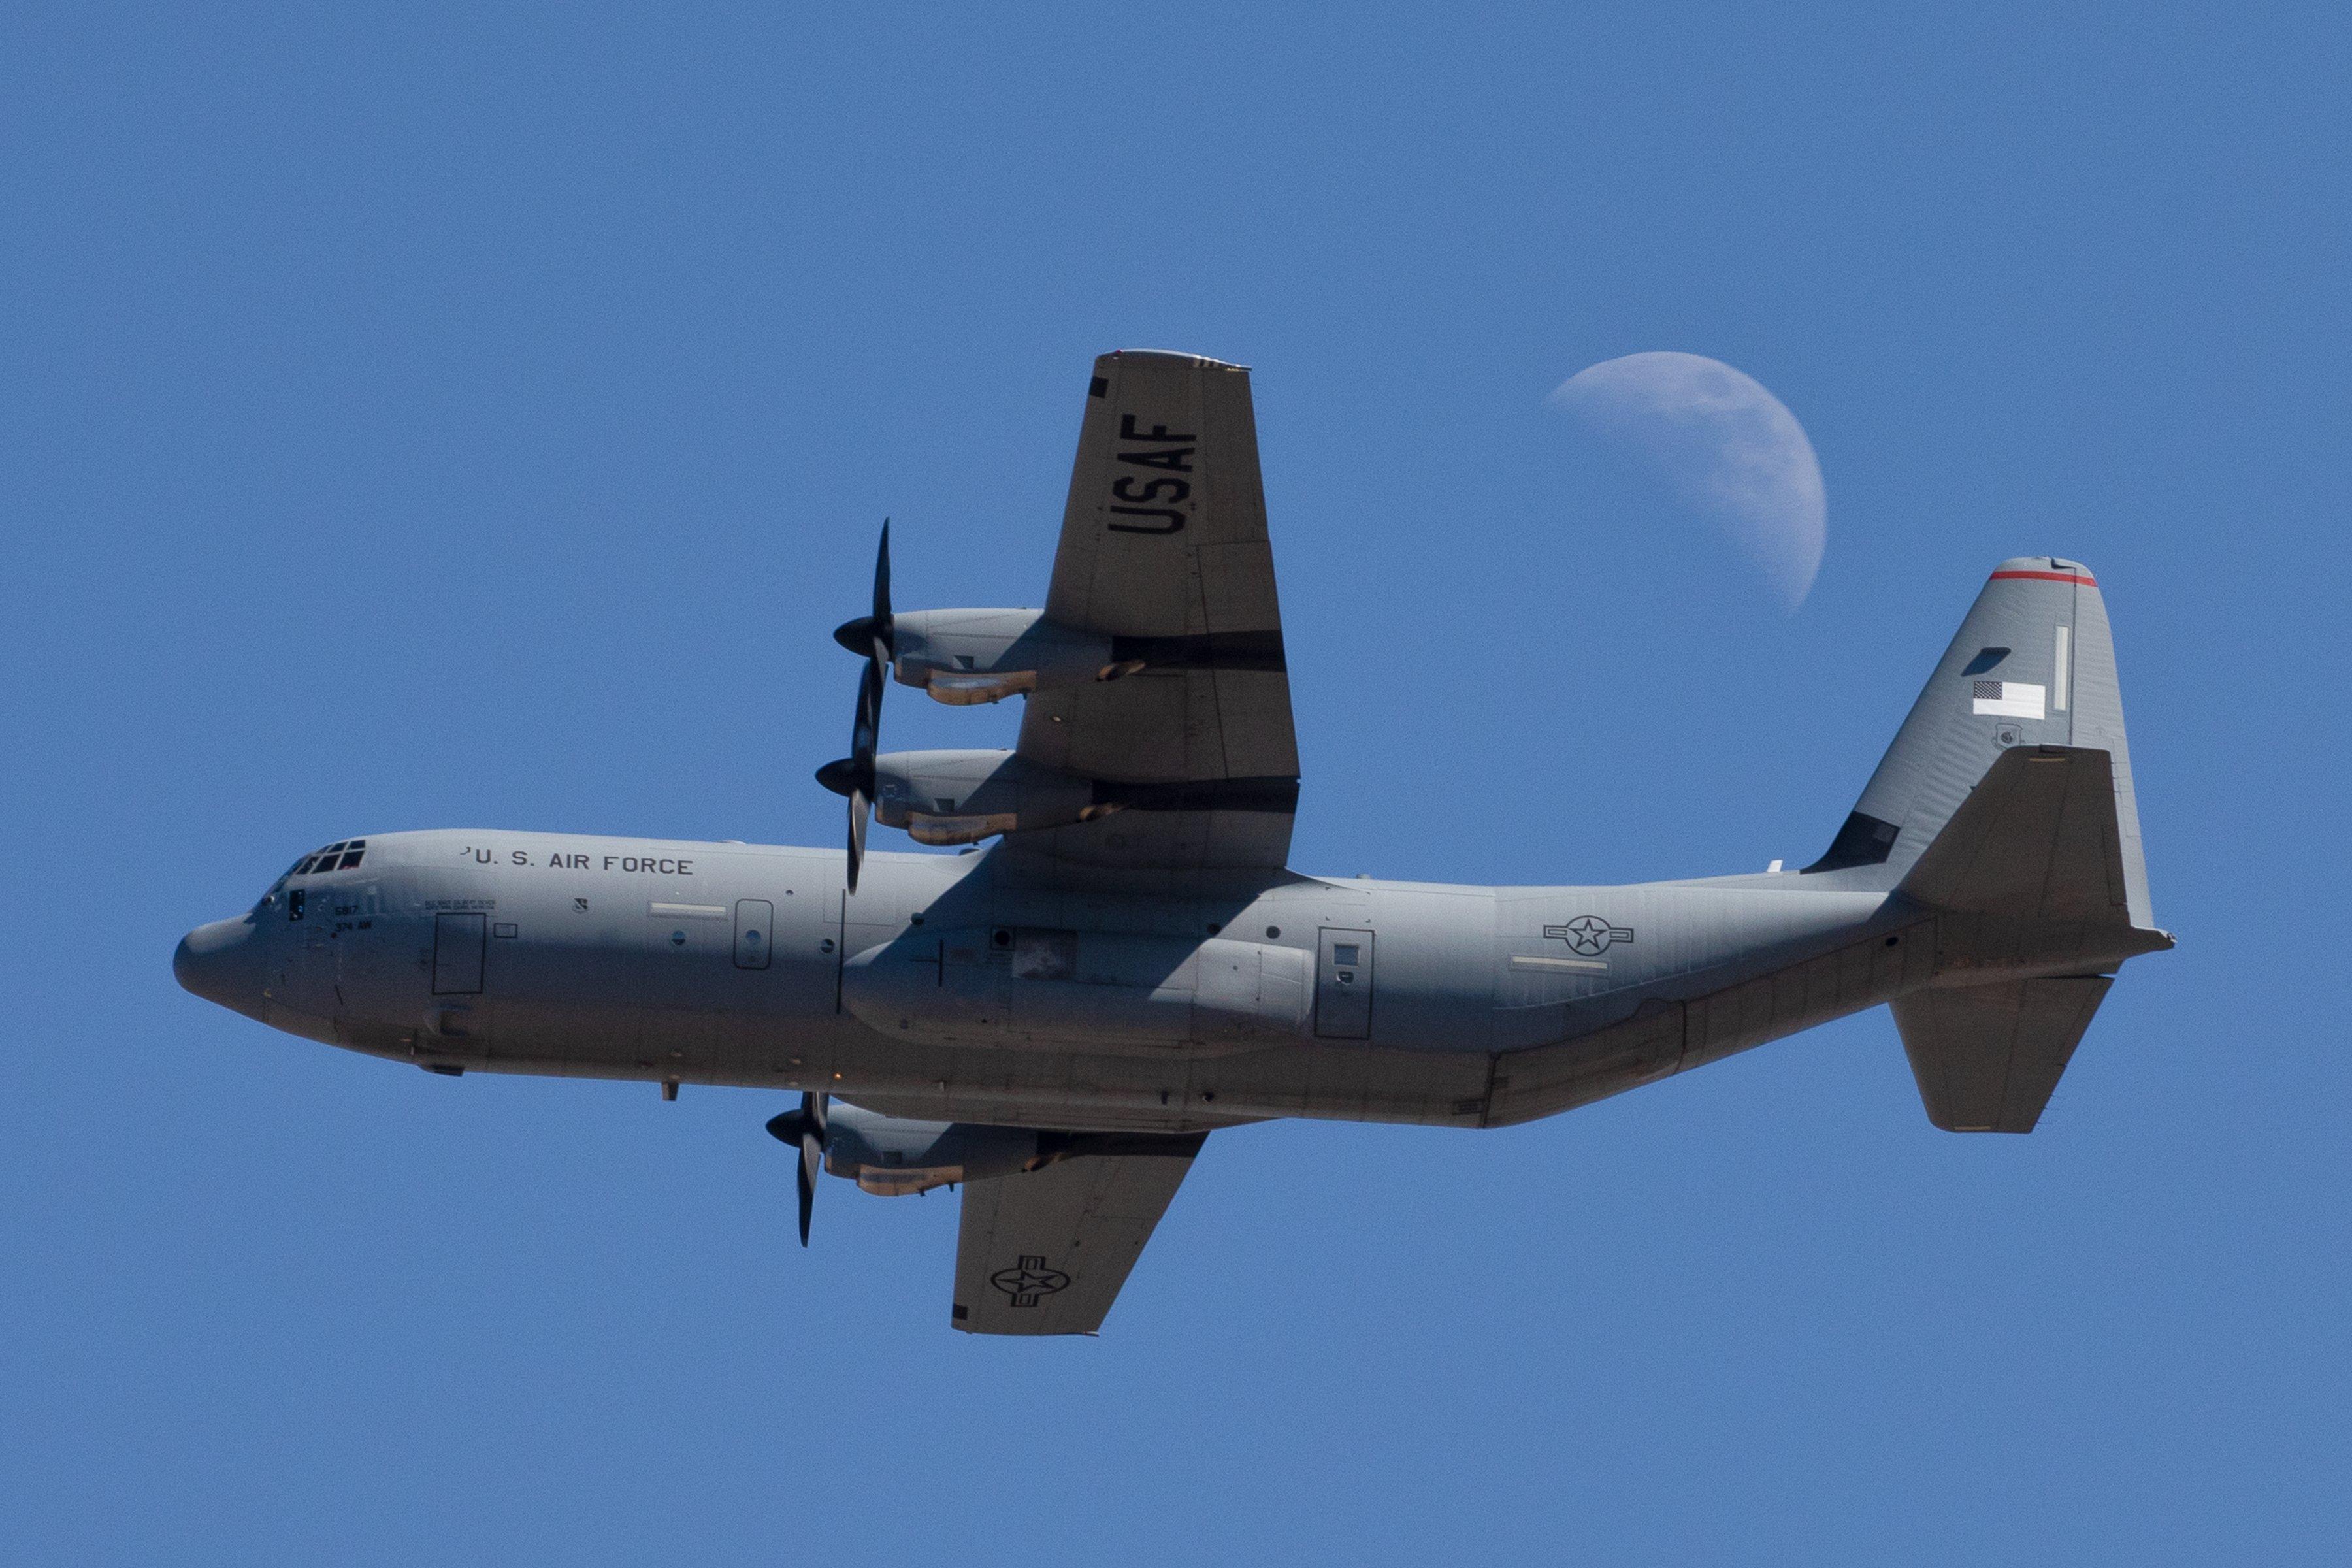 USAF C-130J-30 over Yokota AB, Japan [USAF/Yasuo Osakabe]